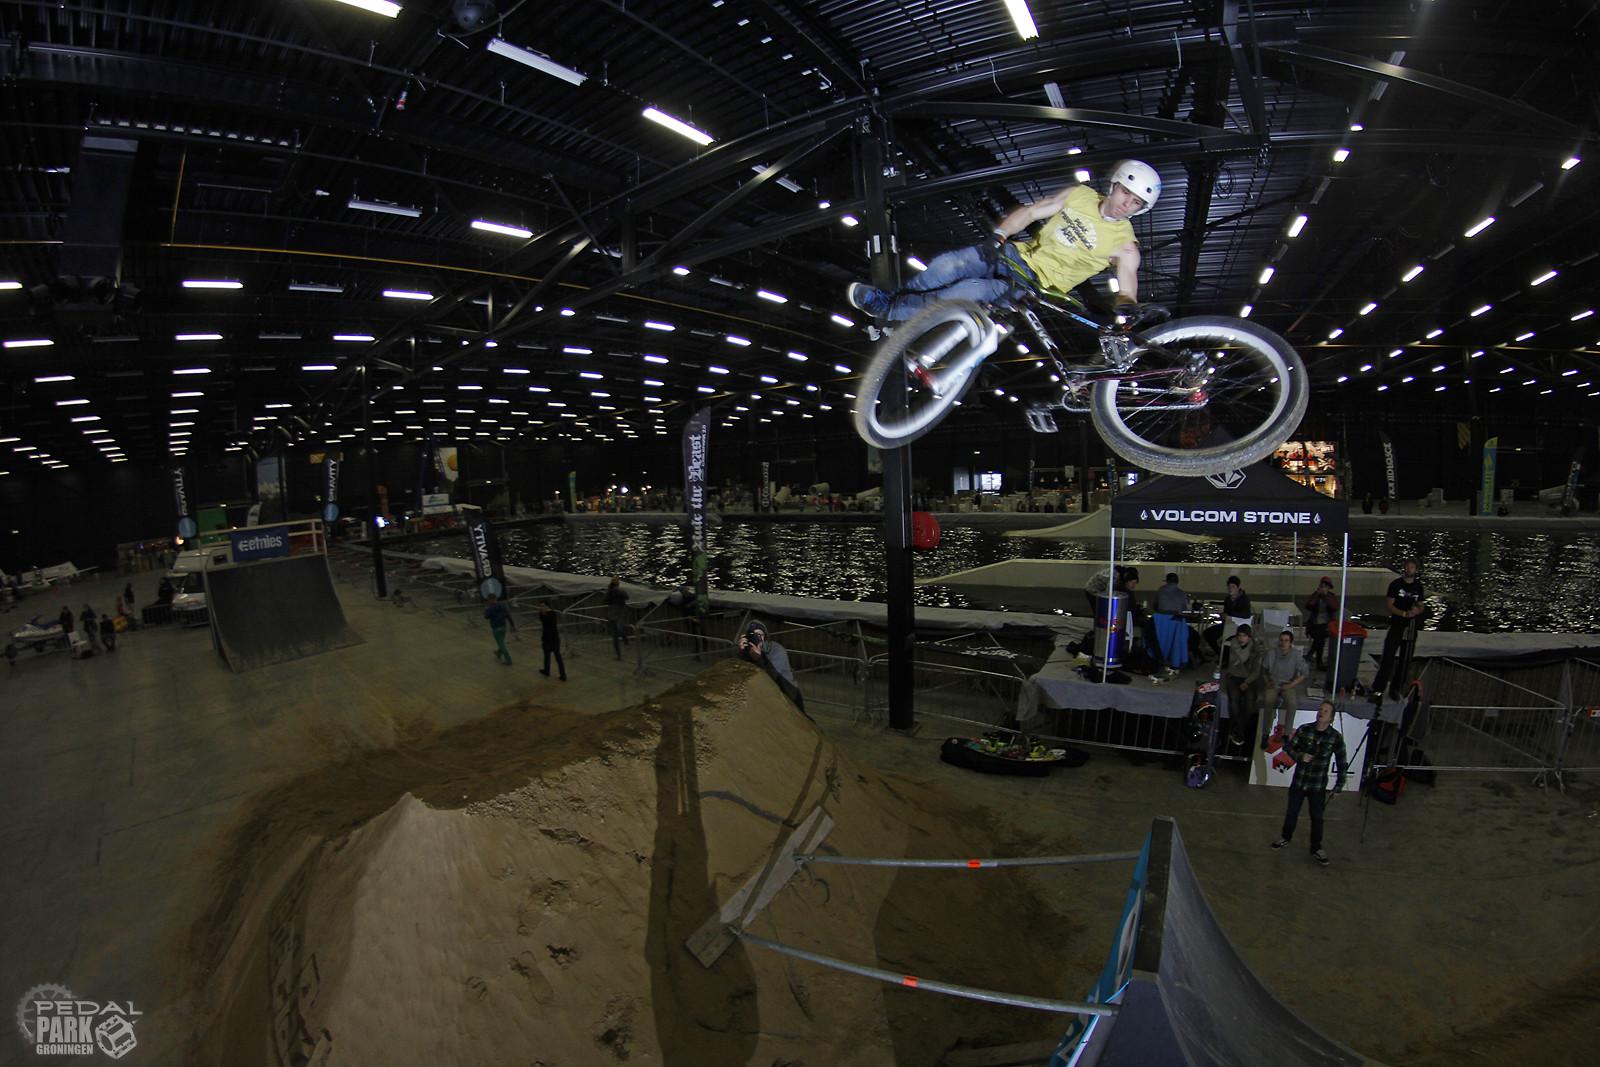 taking the win!!! - PedalPark - Mountain Biking Pictures - Vital MTB